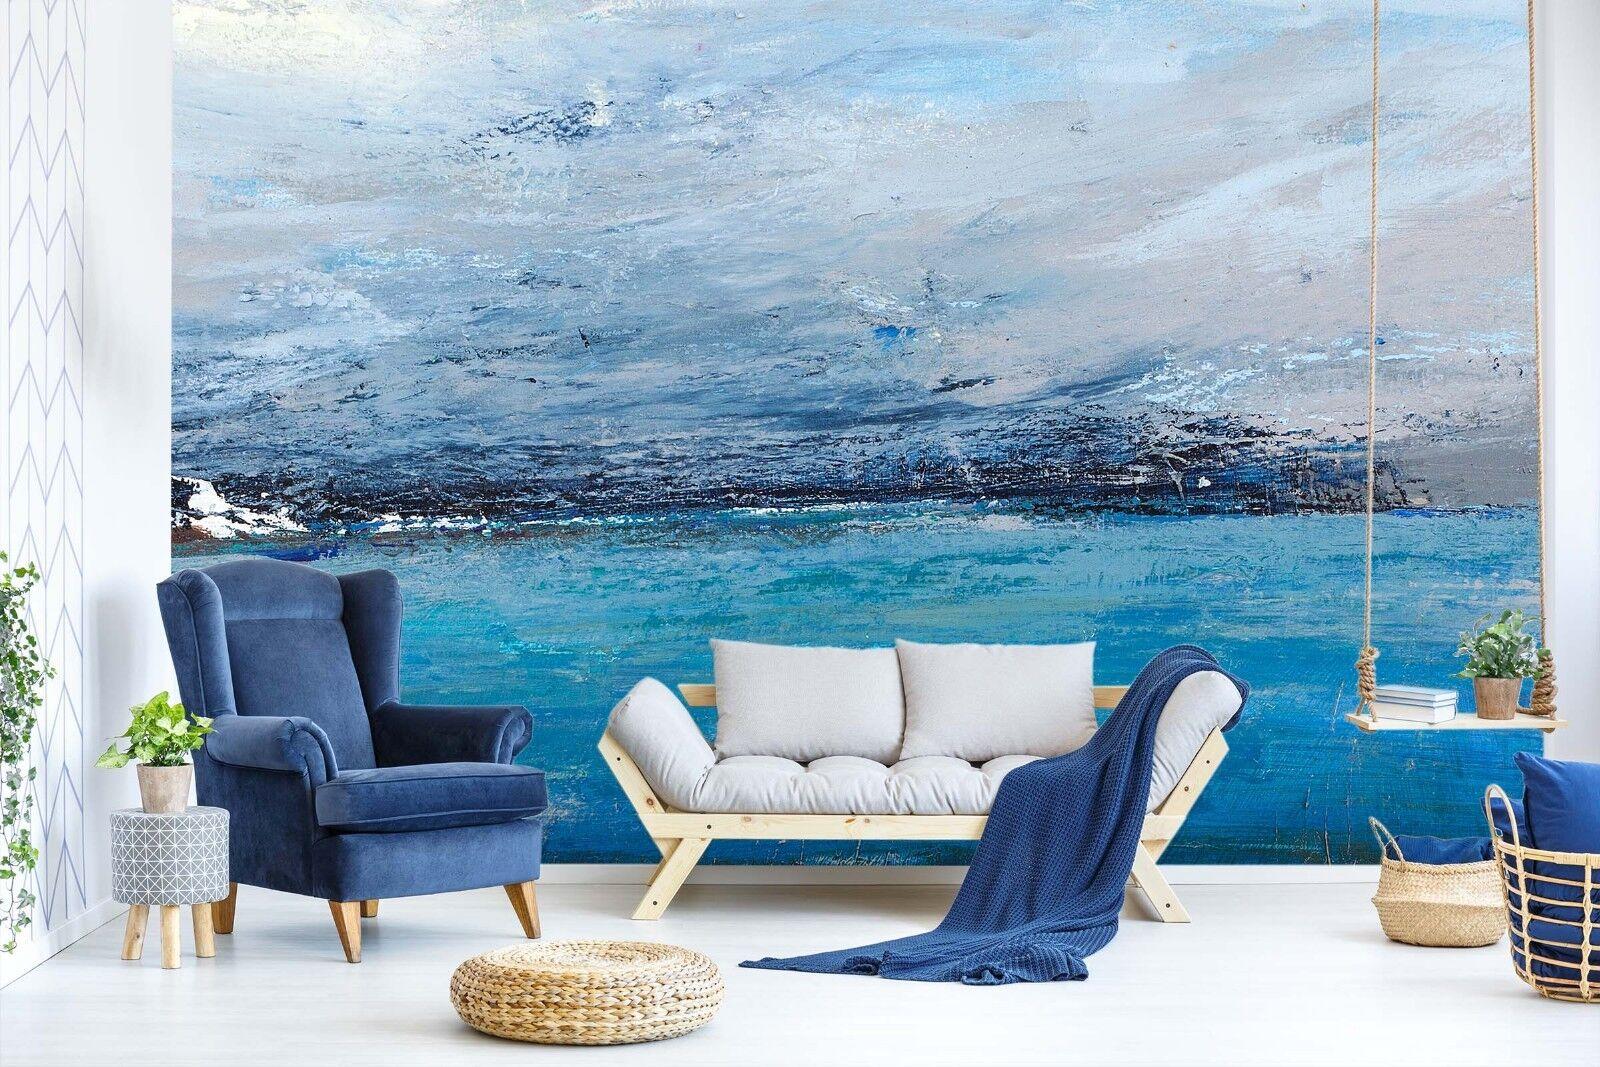 3D Seen Blau 7126 Tapete Wandgemälde Tapete Tapeten Bild Familie DE Sidney | Verschiedene  | Luxus  | Online Shop